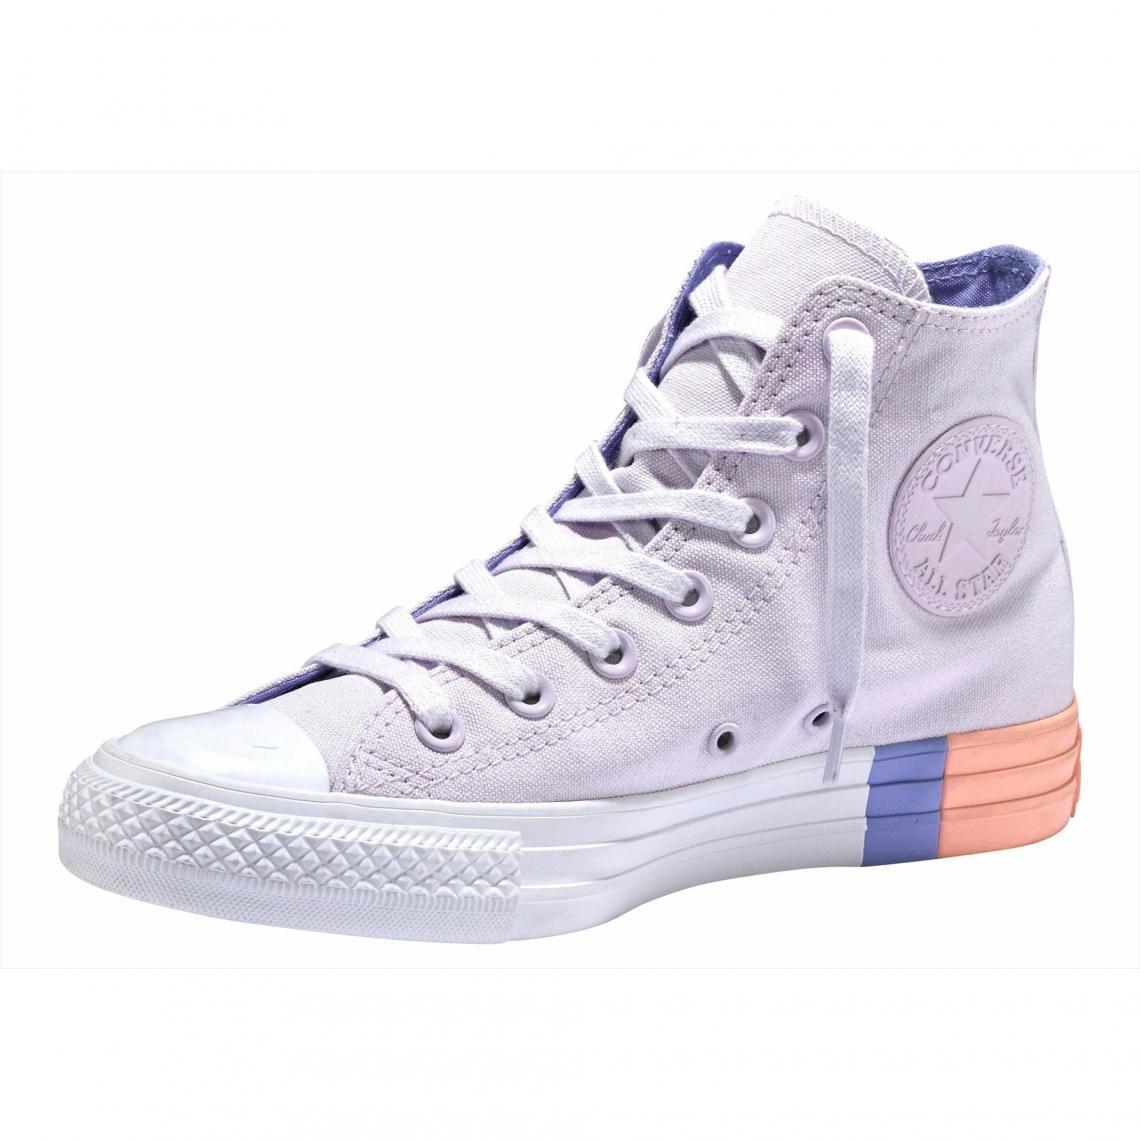 Baskets montantes femme Converse Chuck Taylor All Star Hi Colorblock -  violet clair Converse Homme bc74c494be51